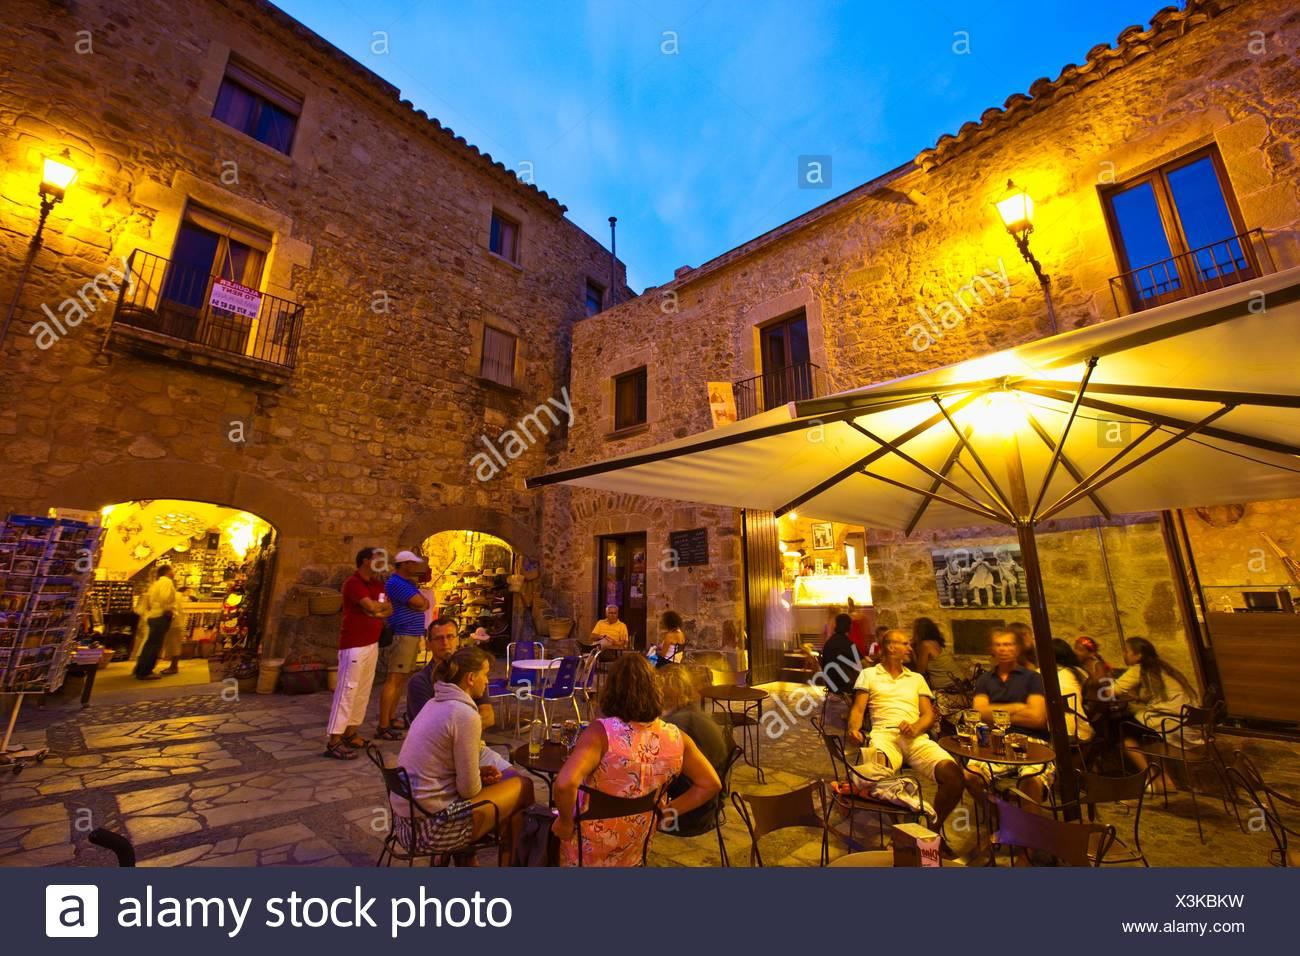 L'EPLA, Baix Empordà, Costa Brava, Gérone, Catalogne, Espagne. Photo Stock